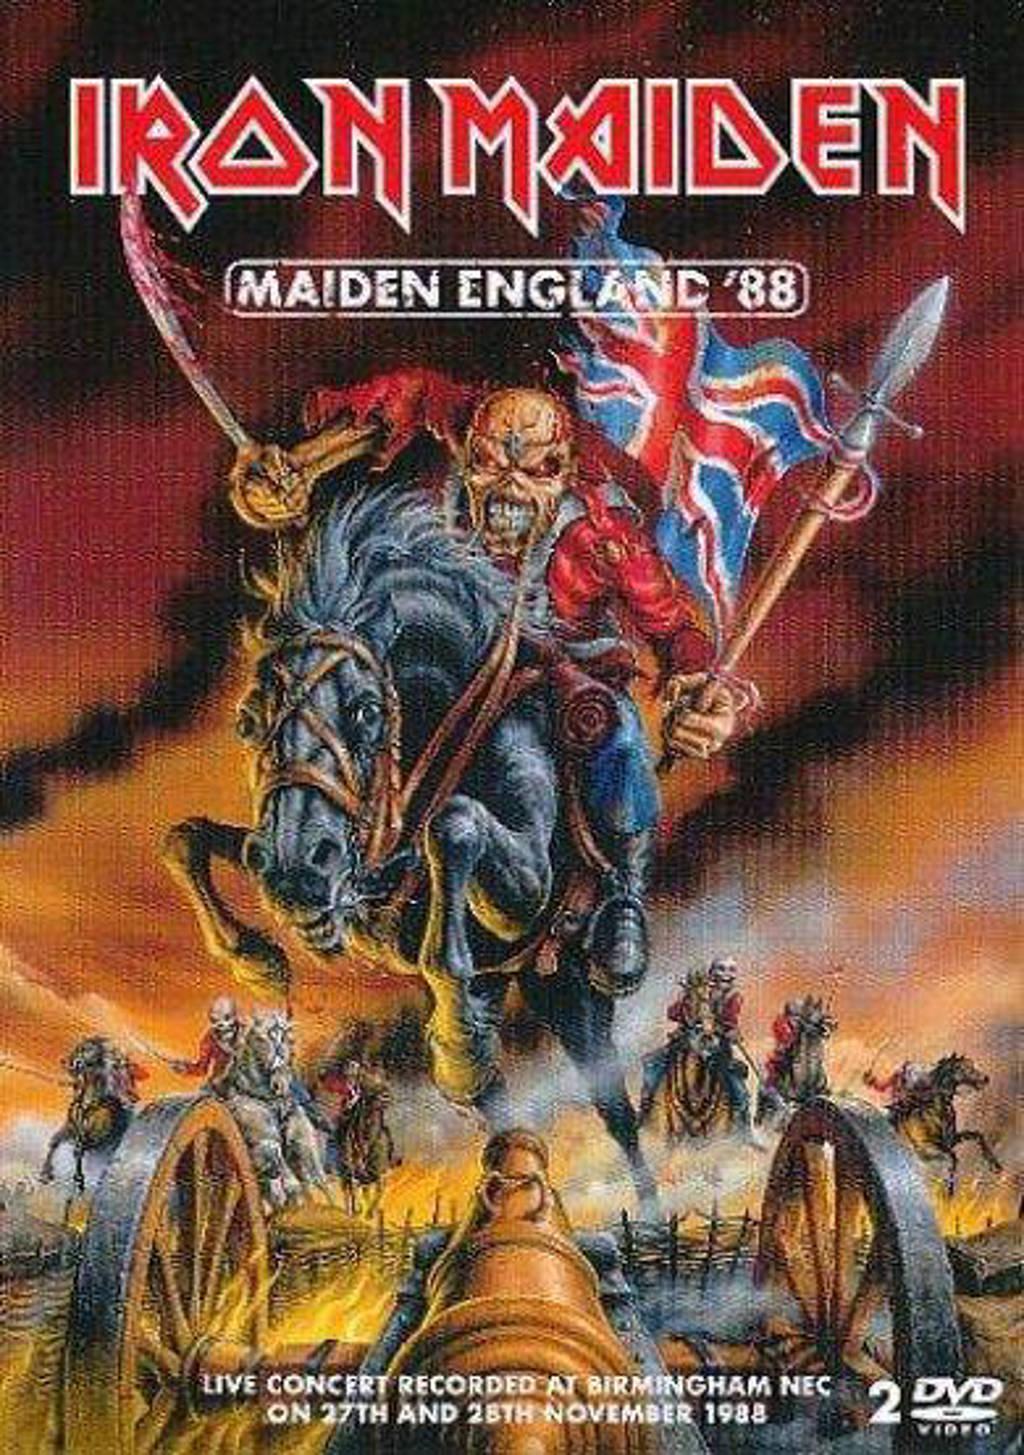 Iron Maiden - Maiden England 88 (DVD)